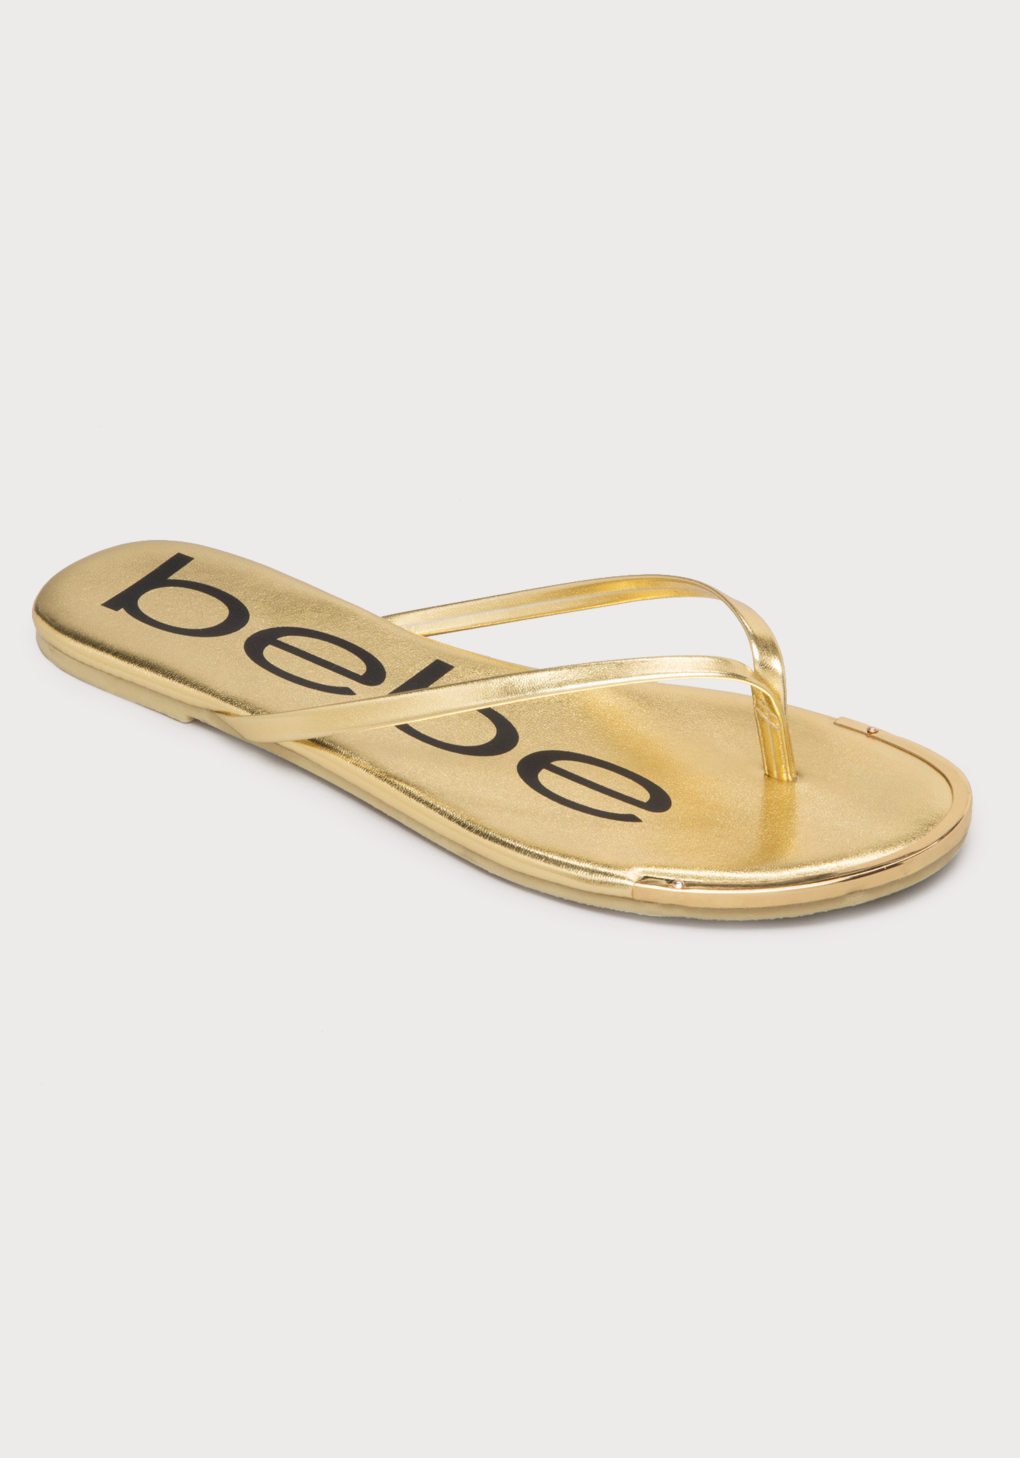 6bd65e248 Lyst - Bebe Ilana Logo Flip Flops in Metallic